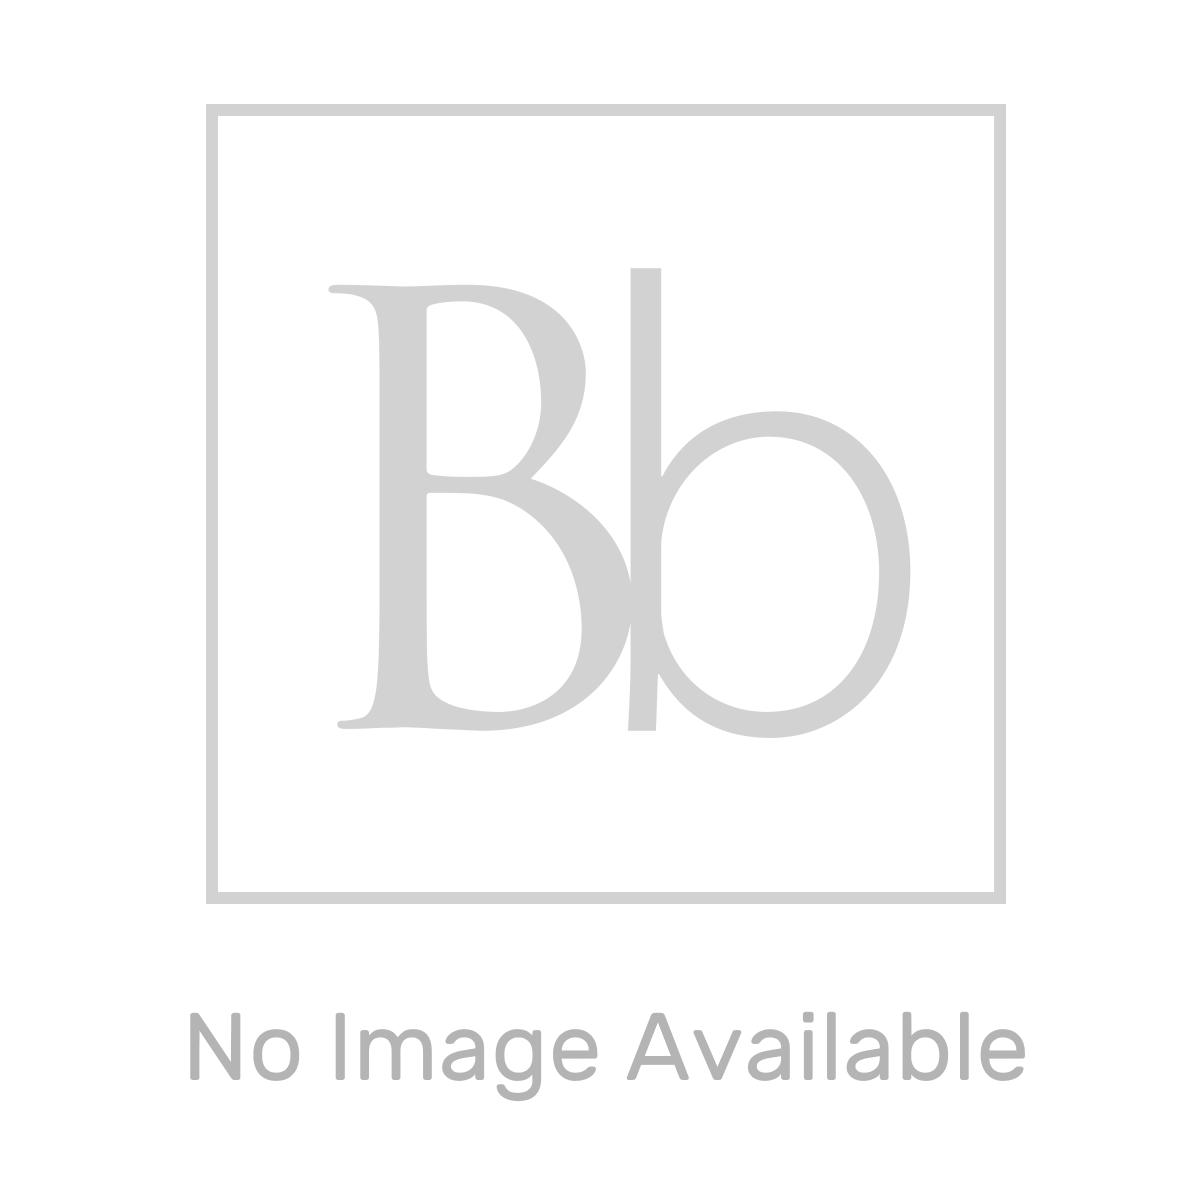 Frontline Standard Rectanglular Shower Tray 800 x 700mm